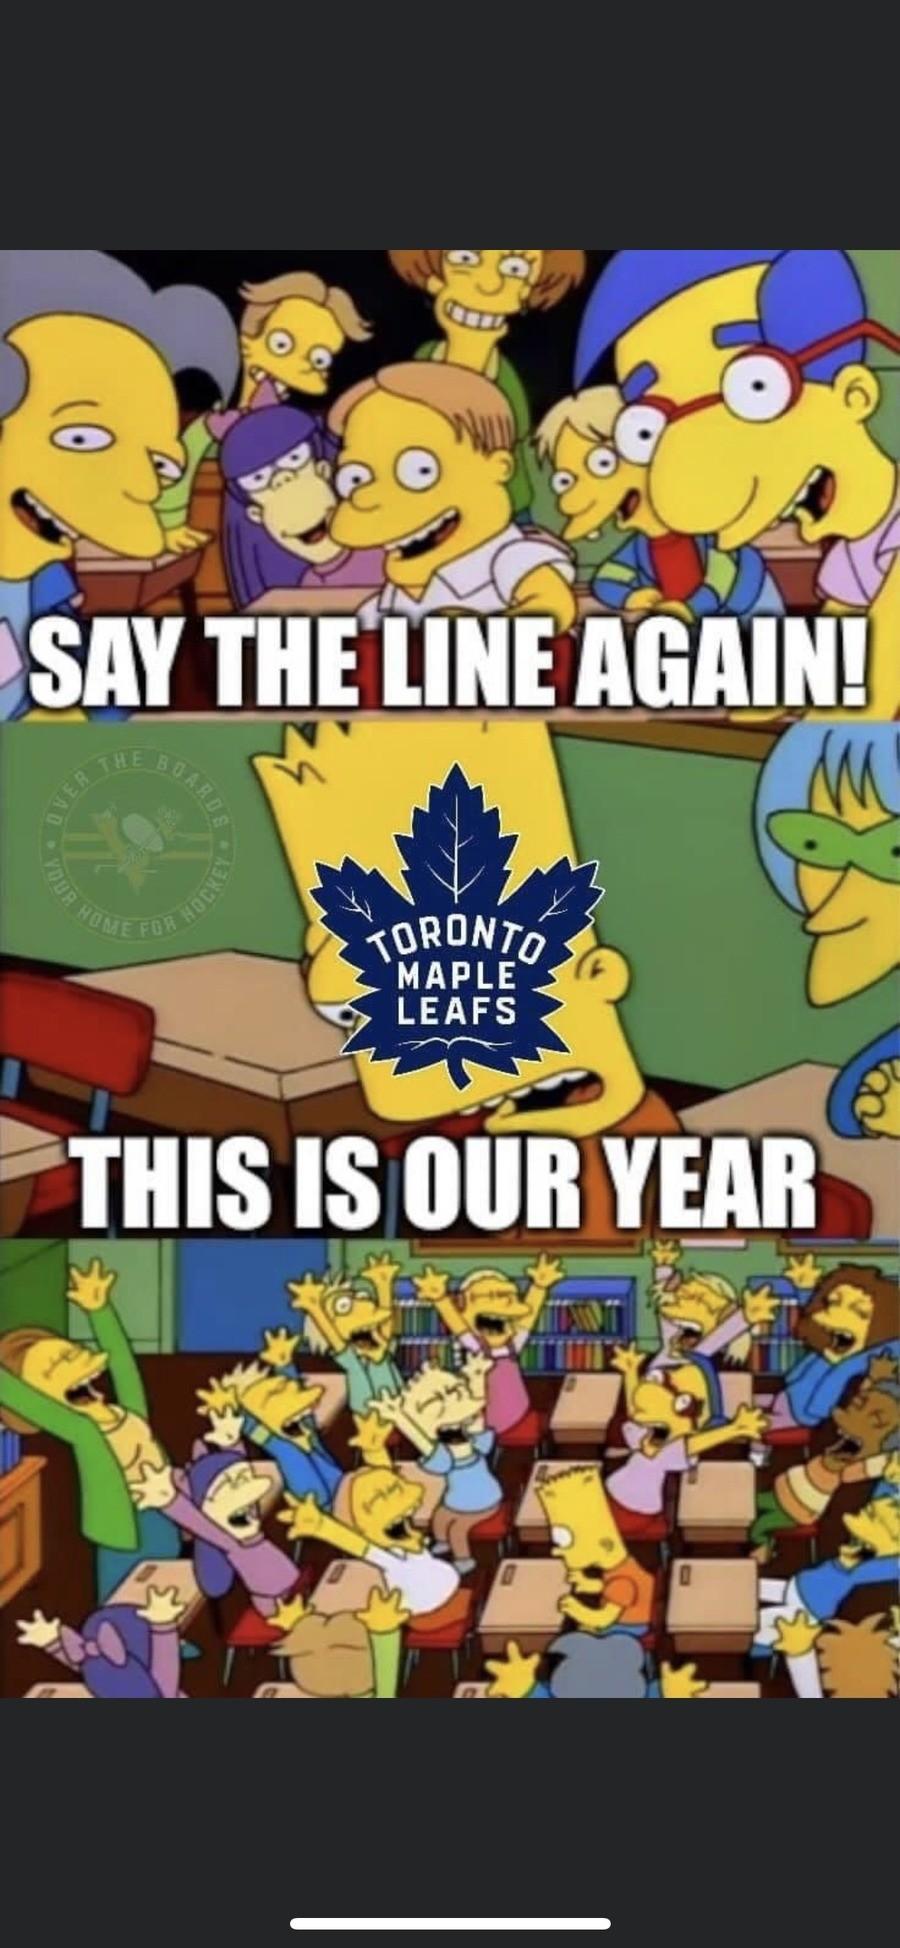 You'll start to slide in February. ..